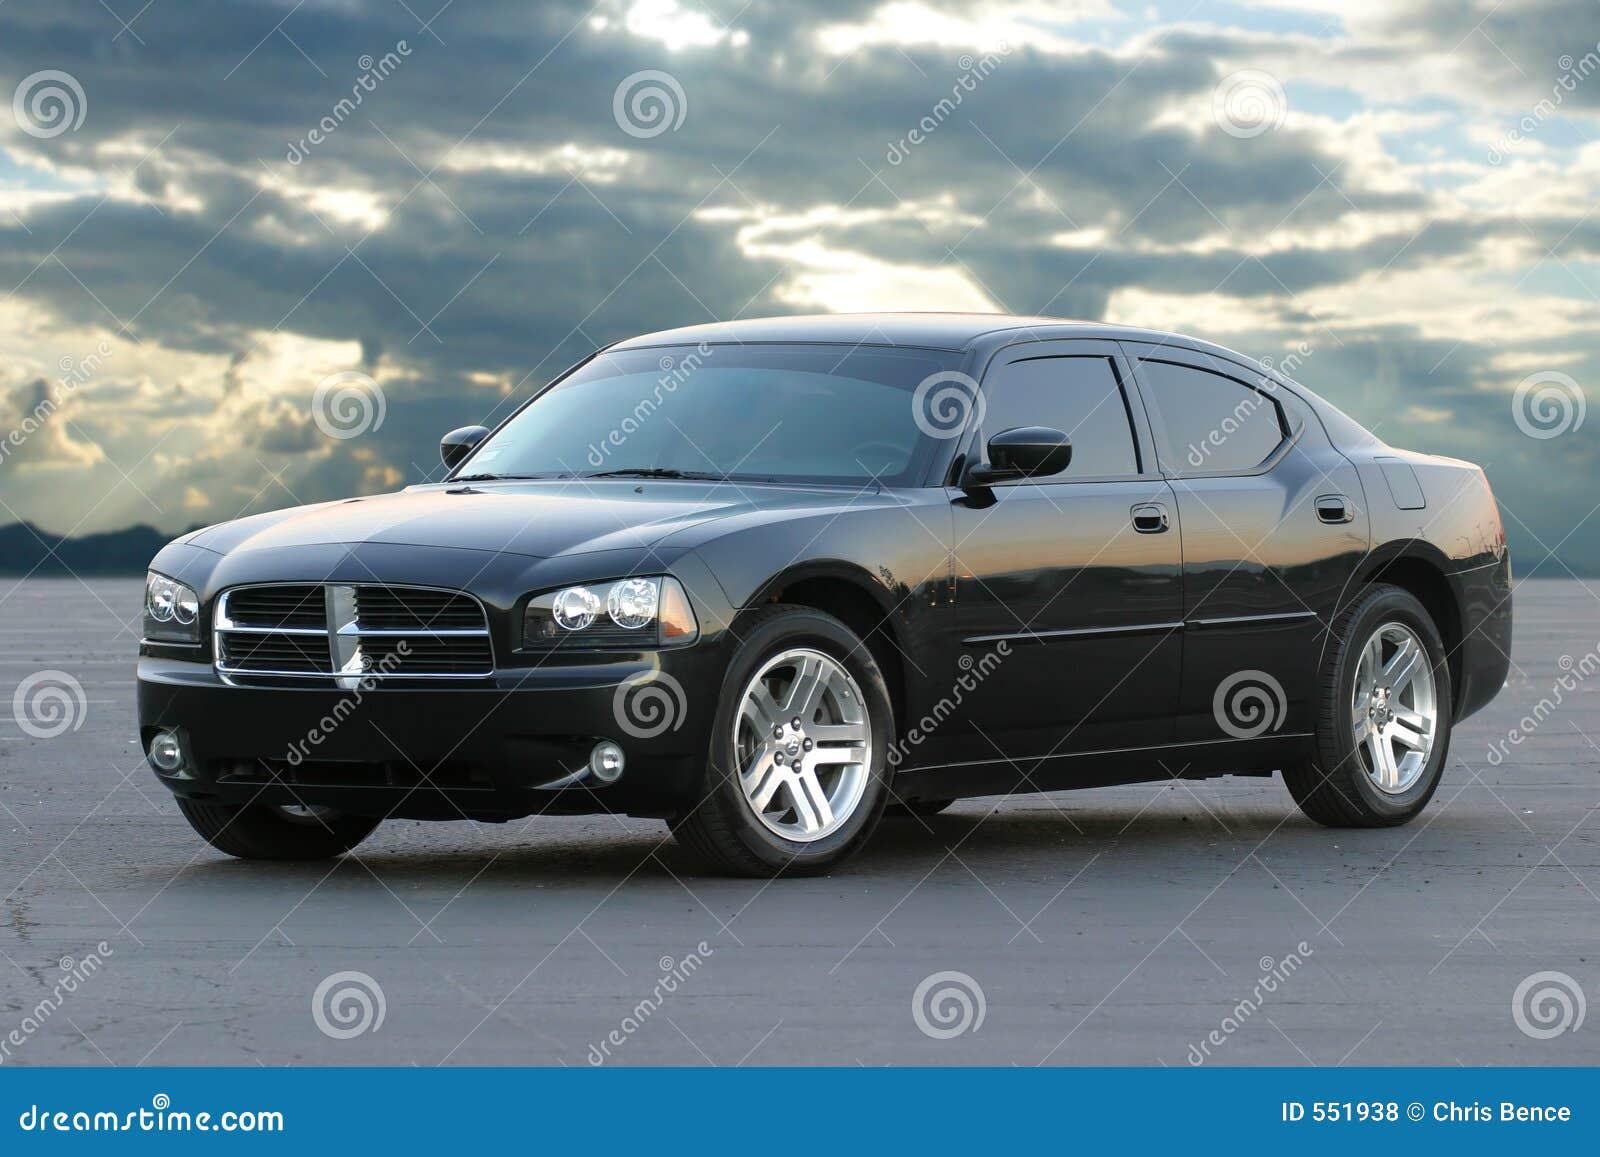 voiture de sport noire photo stock image du vitesse rapide 551938. Black Bedroom Furniture Sets. Home Design Ideas